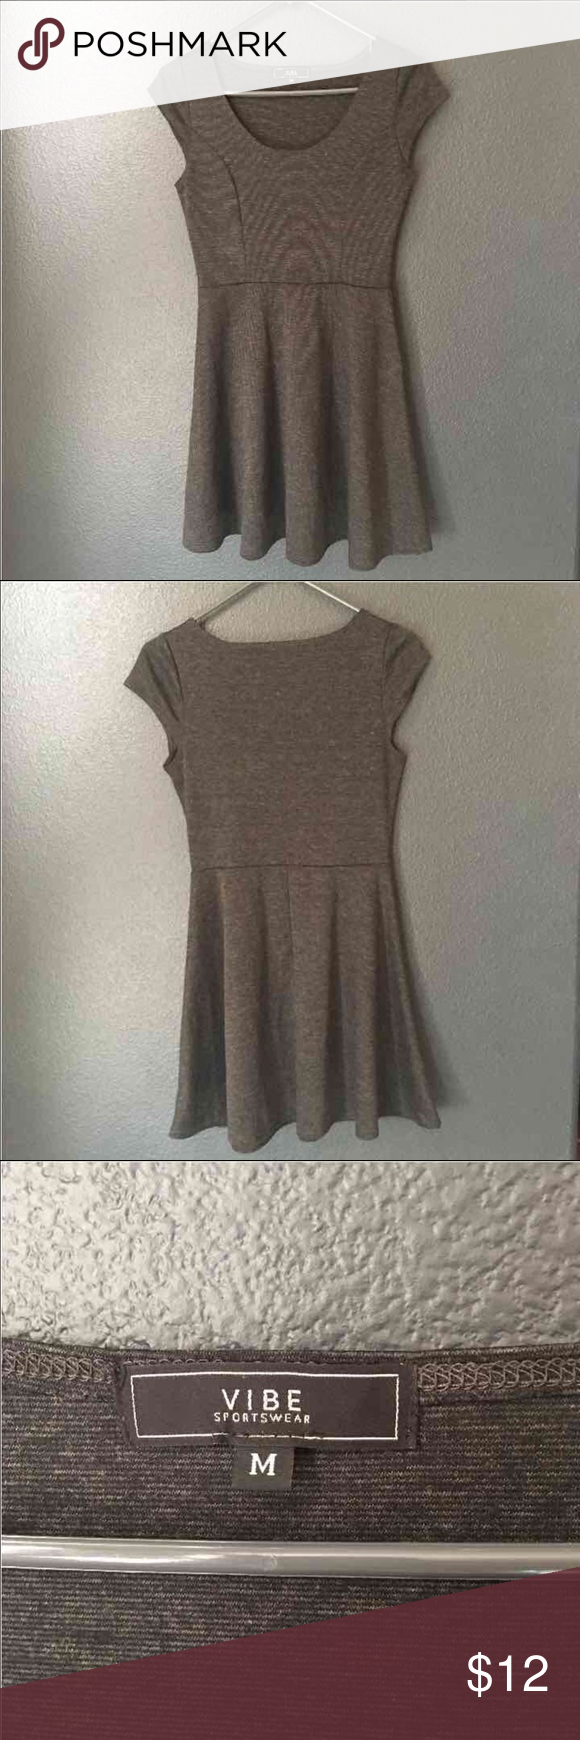 Dark Grey Vibe Sportswear dress Like new Vibe sportswear super cute dress. Size M Vibe Dresses Mini